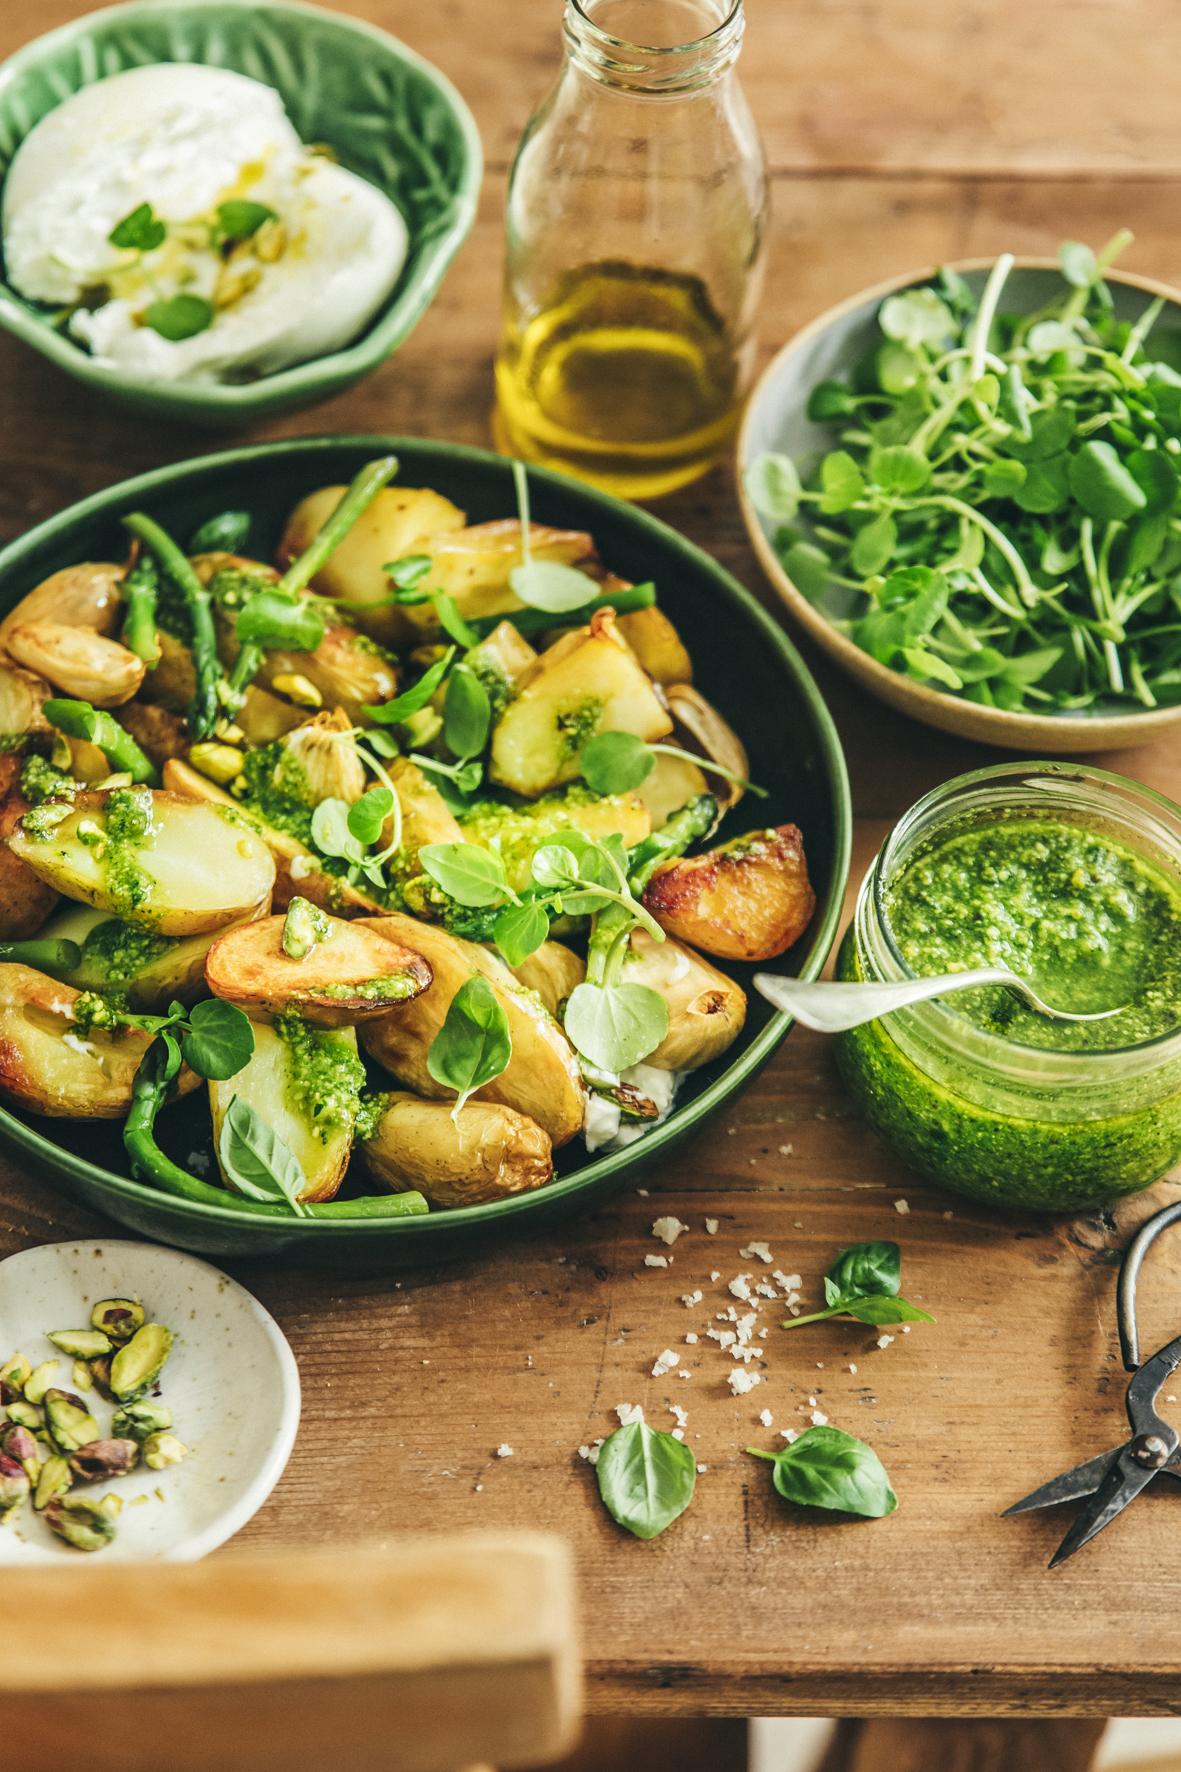 Pommes de terre de primeur rôties, burrata et pesto de cresson ©Sandrine Saadi